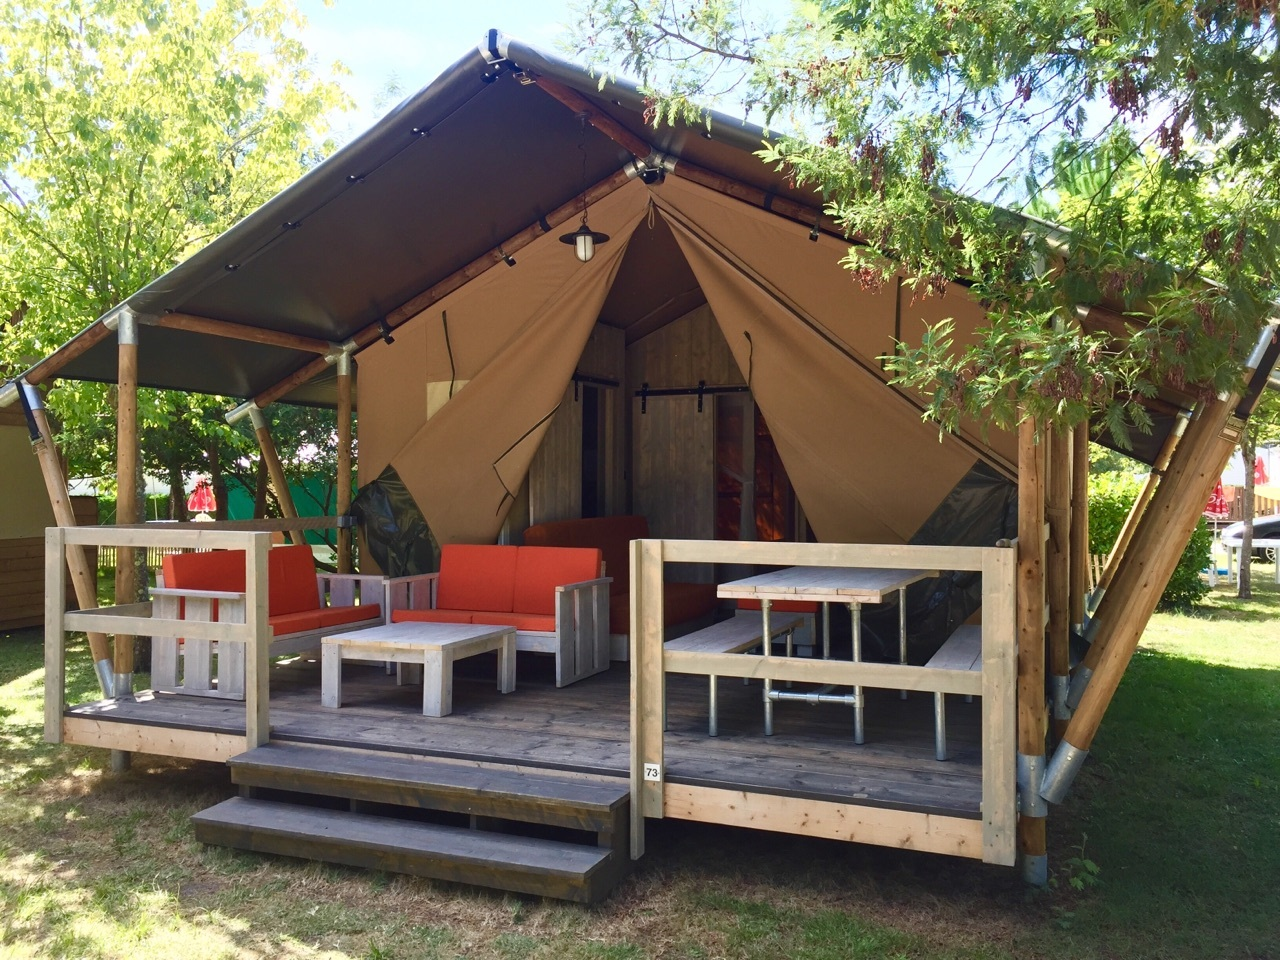 tarif camping toile de tente hourtin